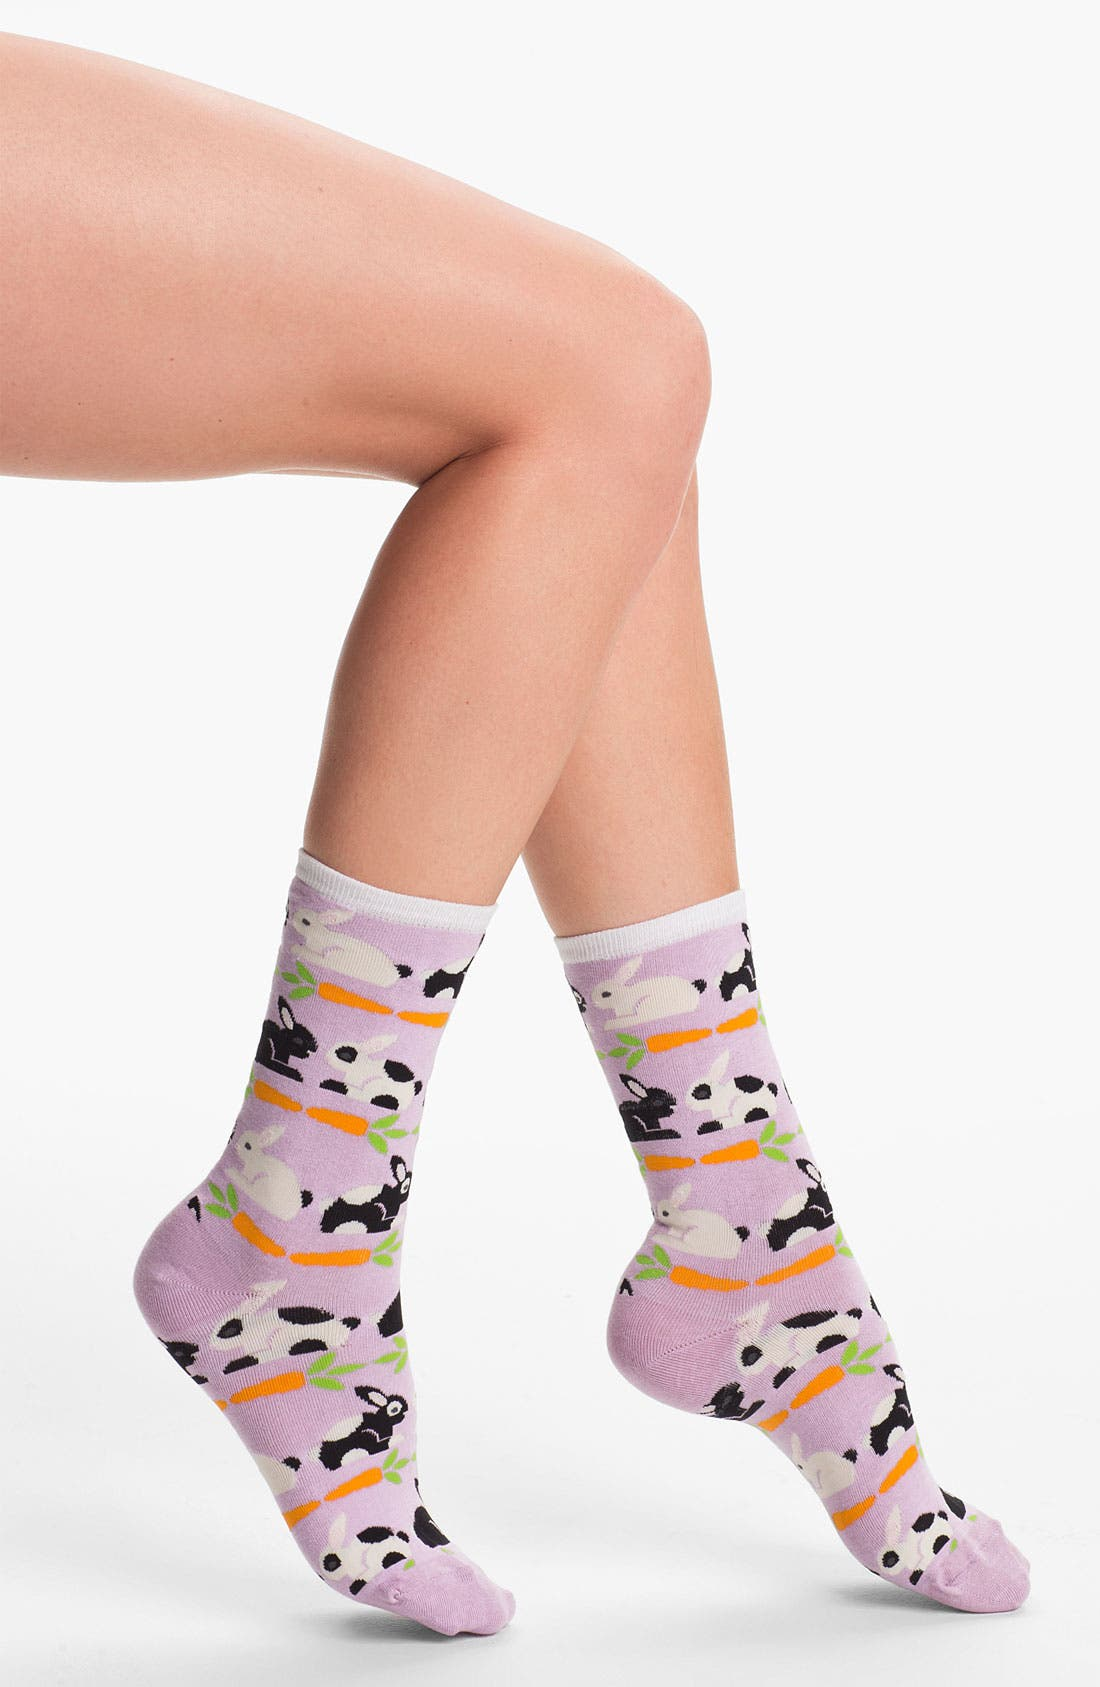 Alternate Image 1 Selected - Hot Sox 'Rabbits & Carrots' Socks